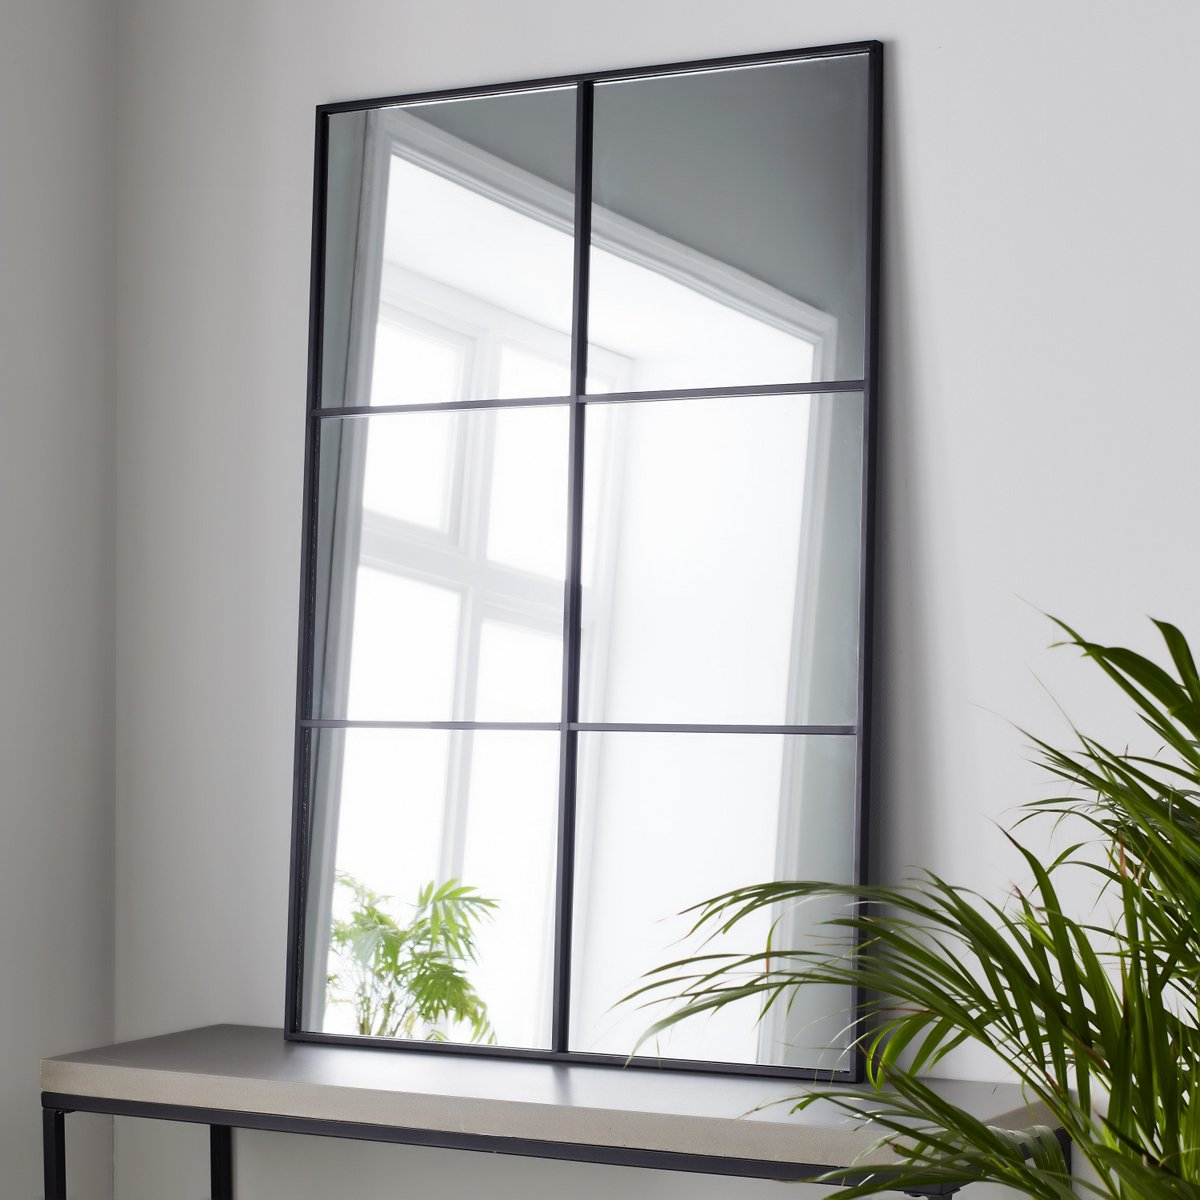 https://www.paulromi.com/collections/living/products/manhattan-window-mirror